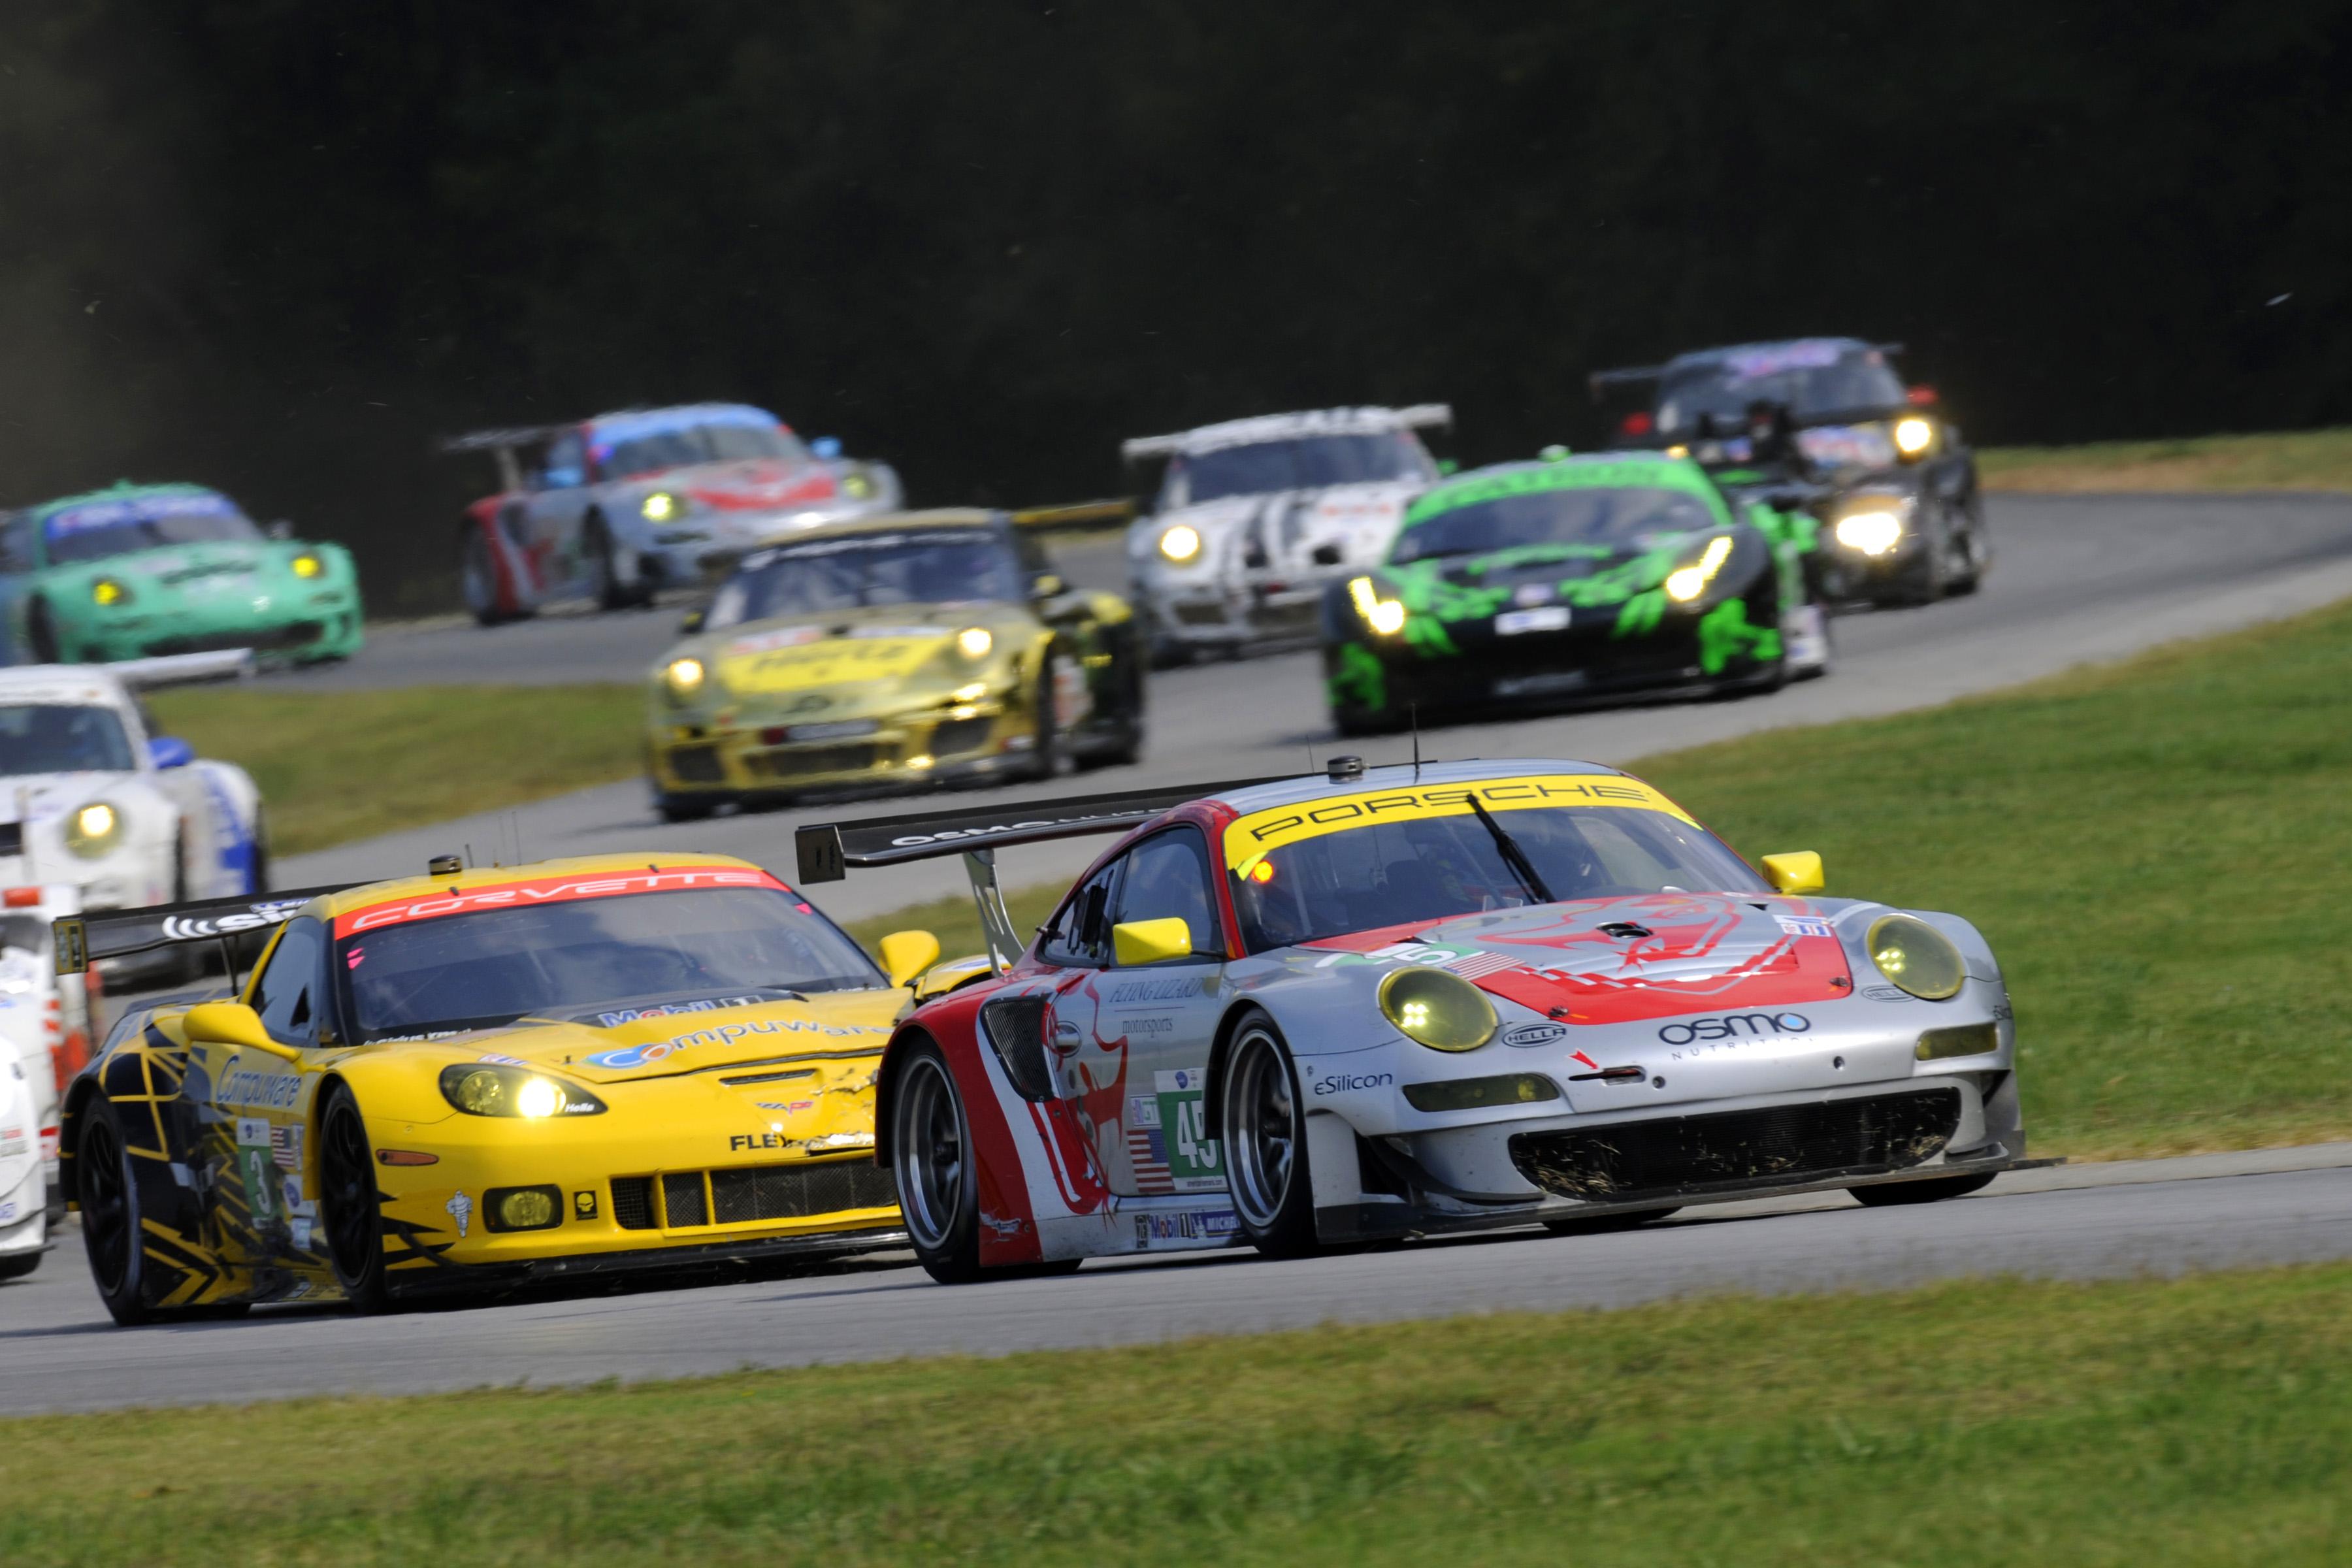 m12_3863_fine Inspiring Porsche 911 Gt1 Road atlanta Cars Trend